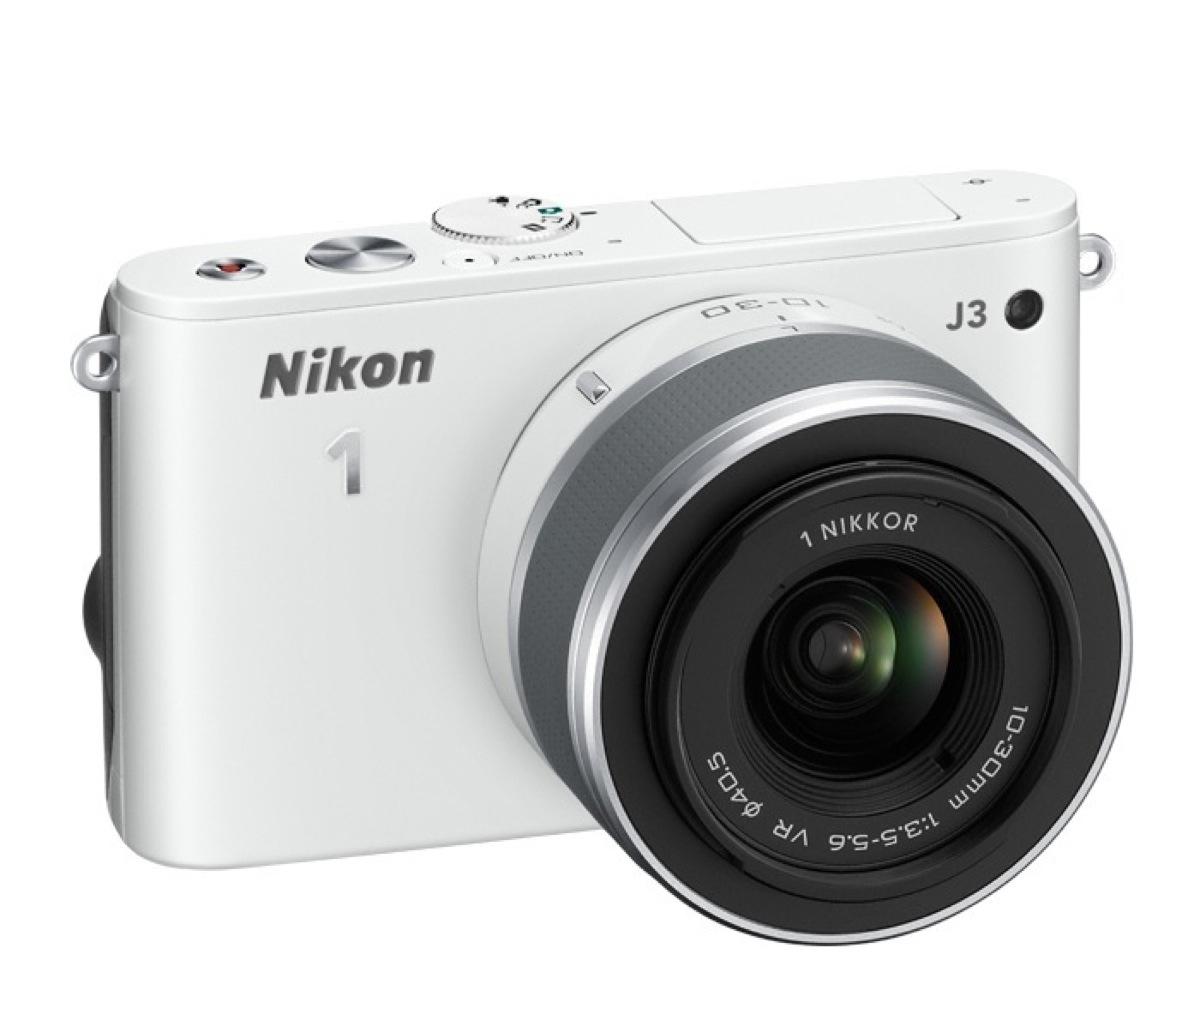 Nikon 1 J3 small